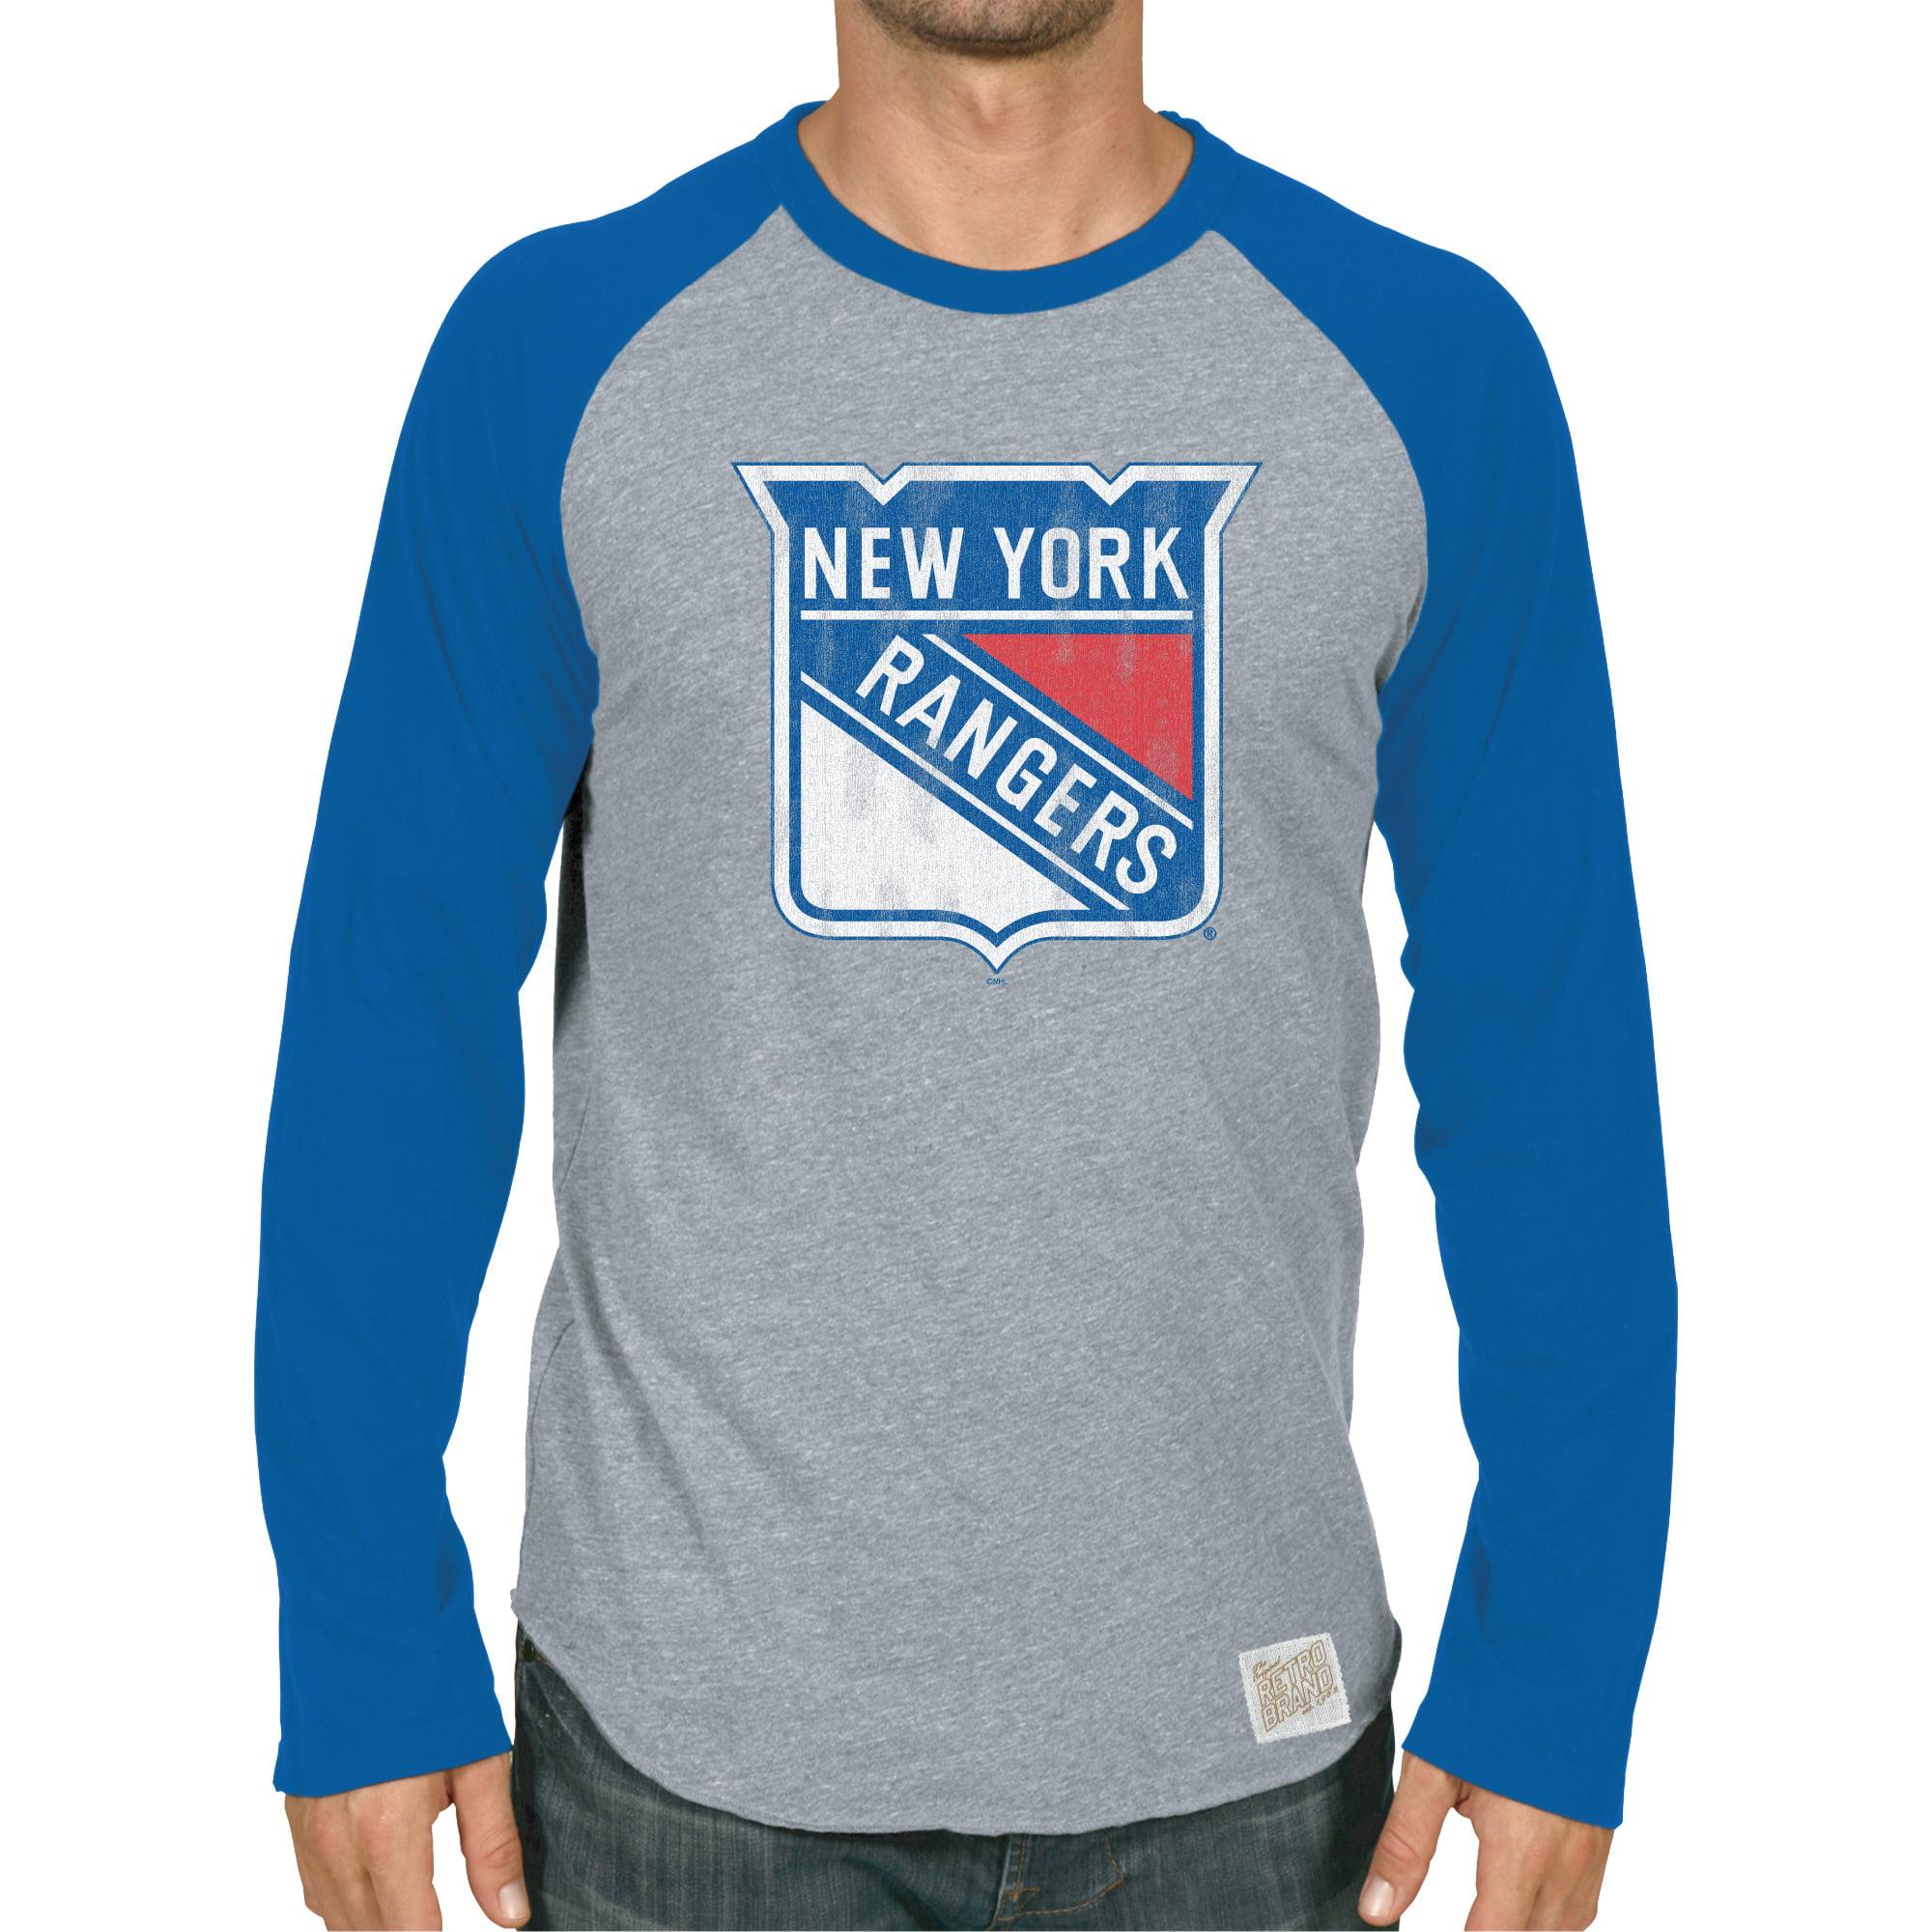 New York Rangers Original Retro Brand Raglan Long Sleeve T-Shirt - Heather Gray/Blue